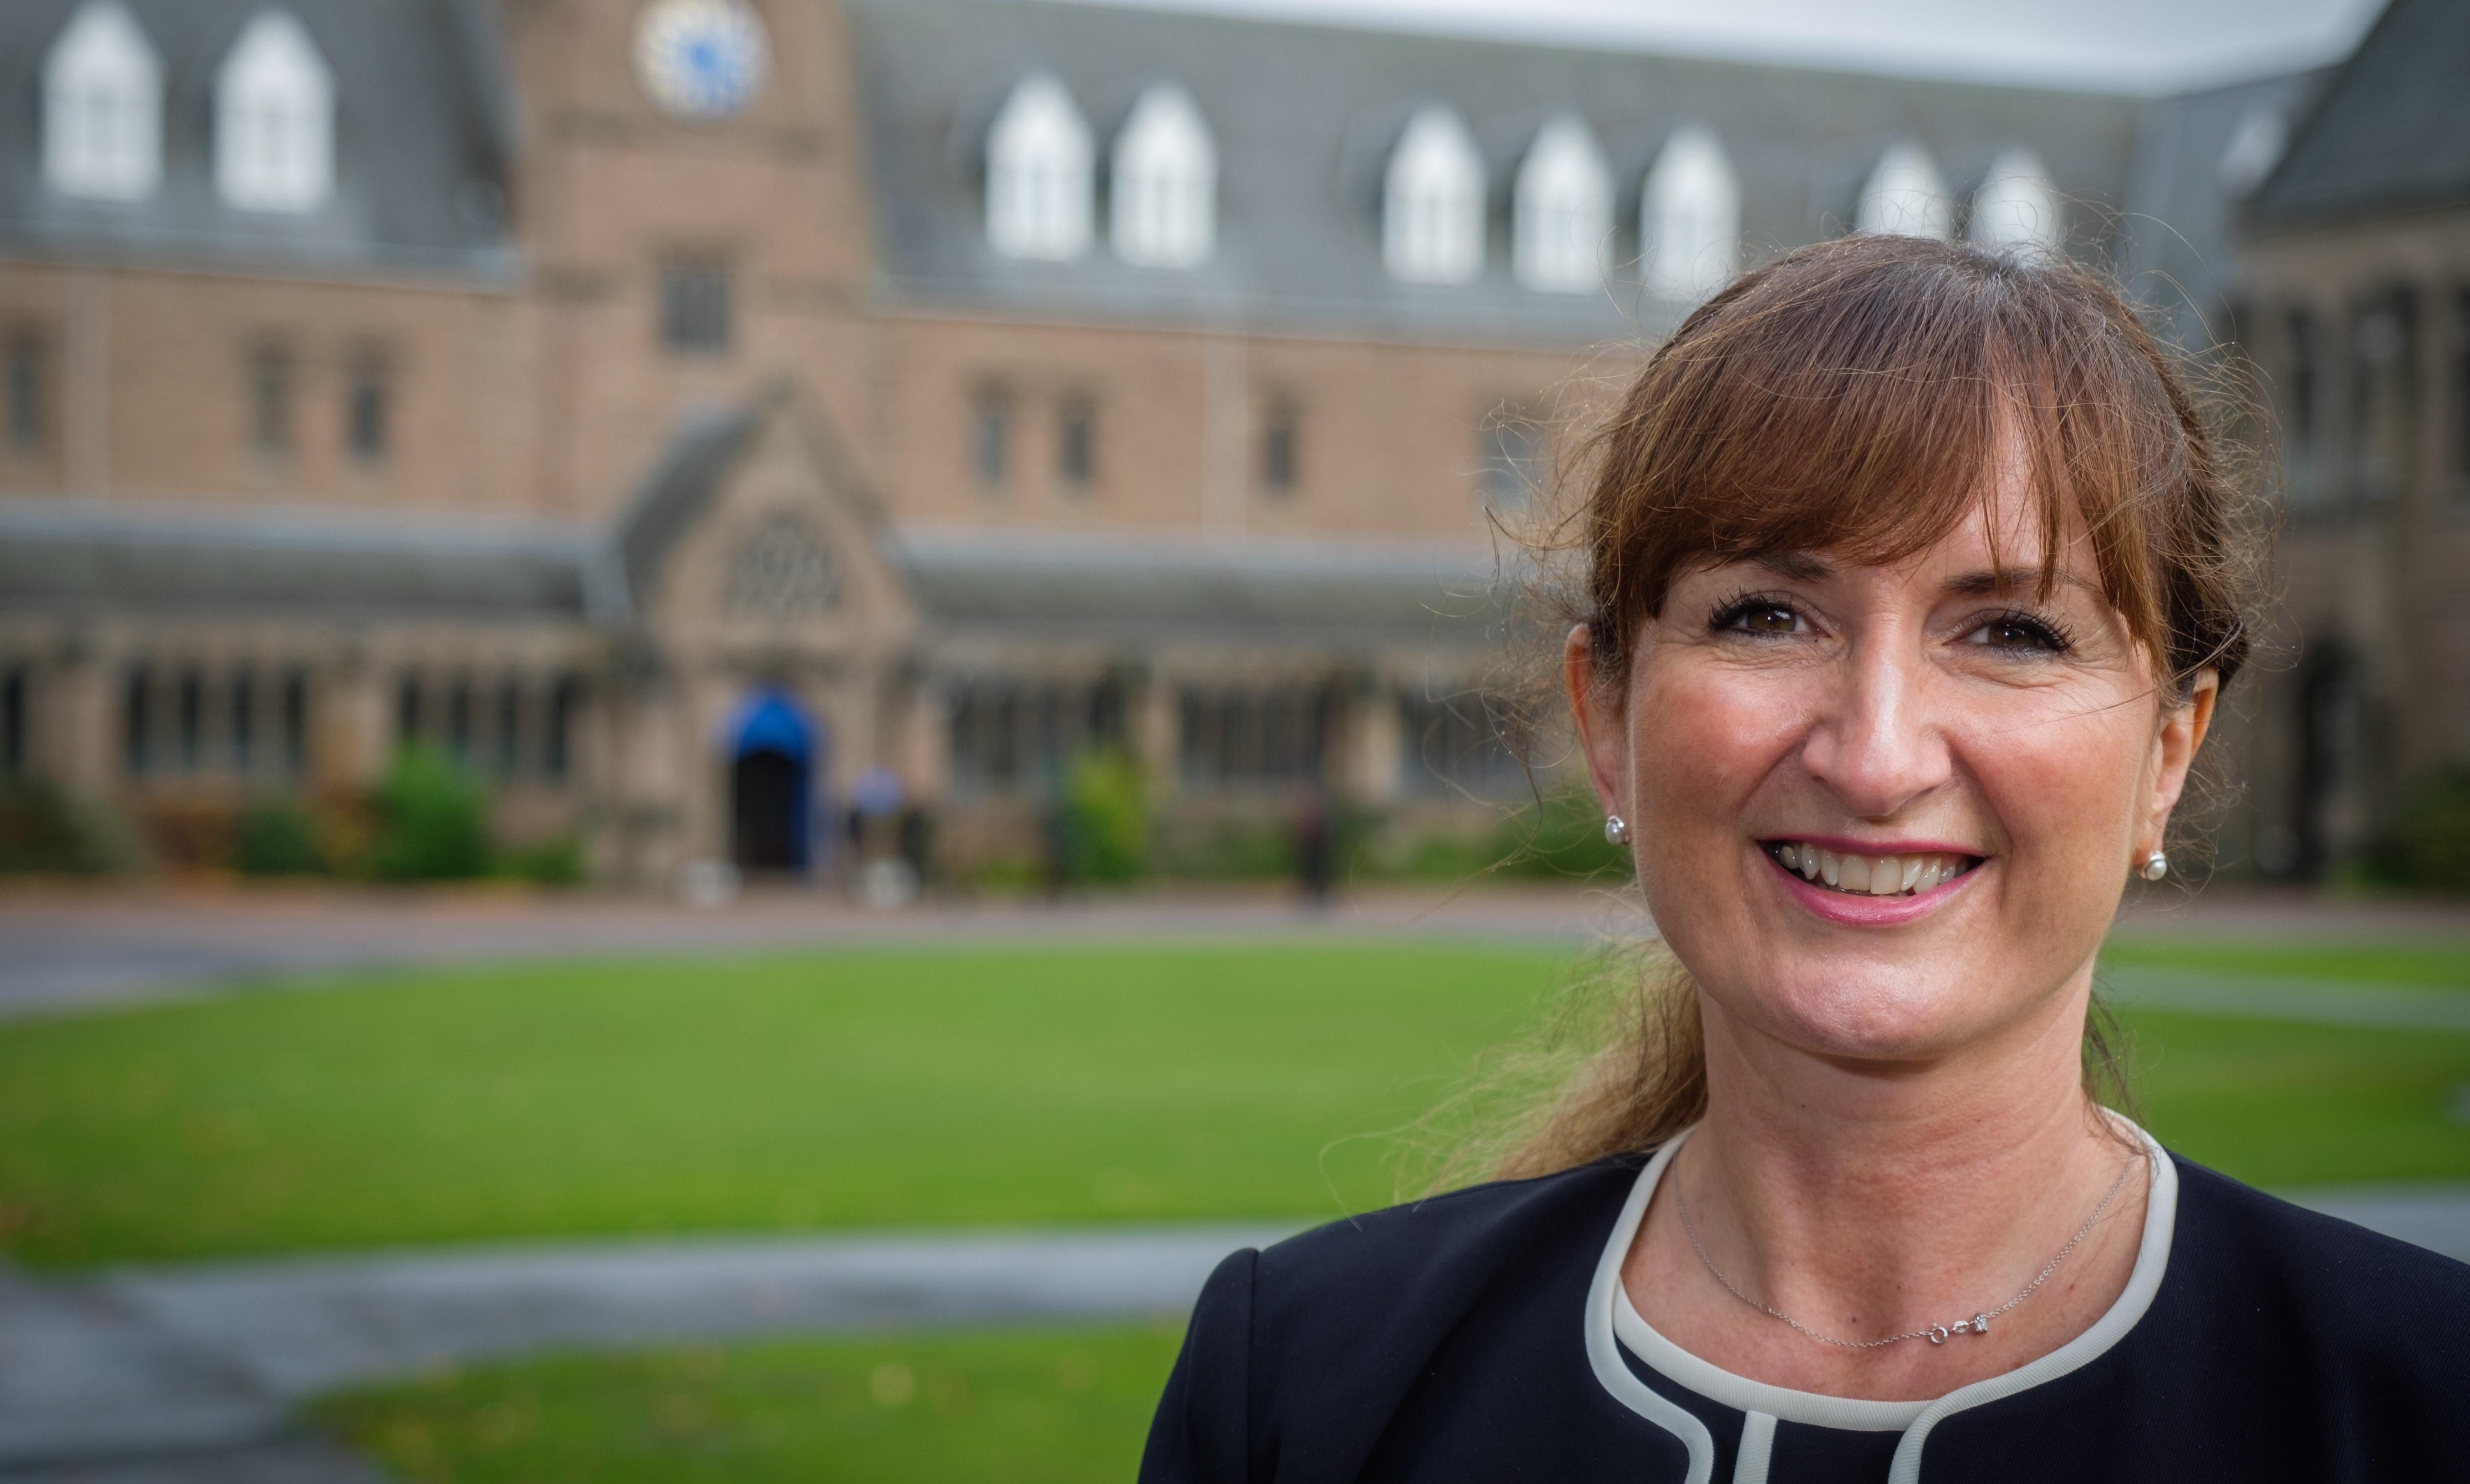 Glenalmond College warden Elaine Logan in 2017